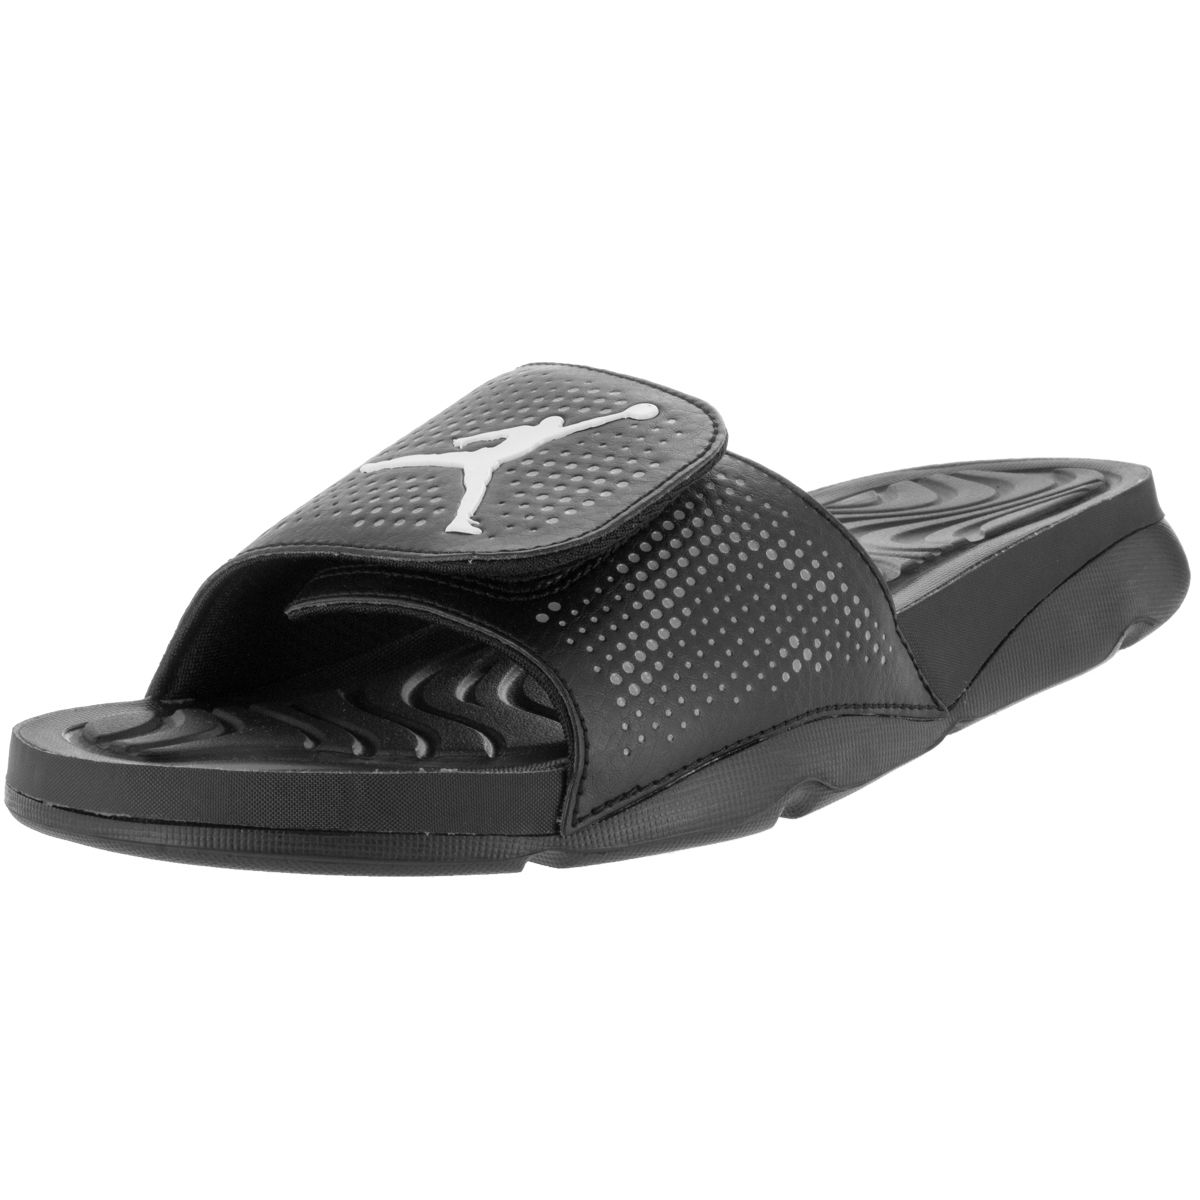 Air Jordan Hydro 5 Slide Sandals Mens Black White Cool Grey Cheap Price